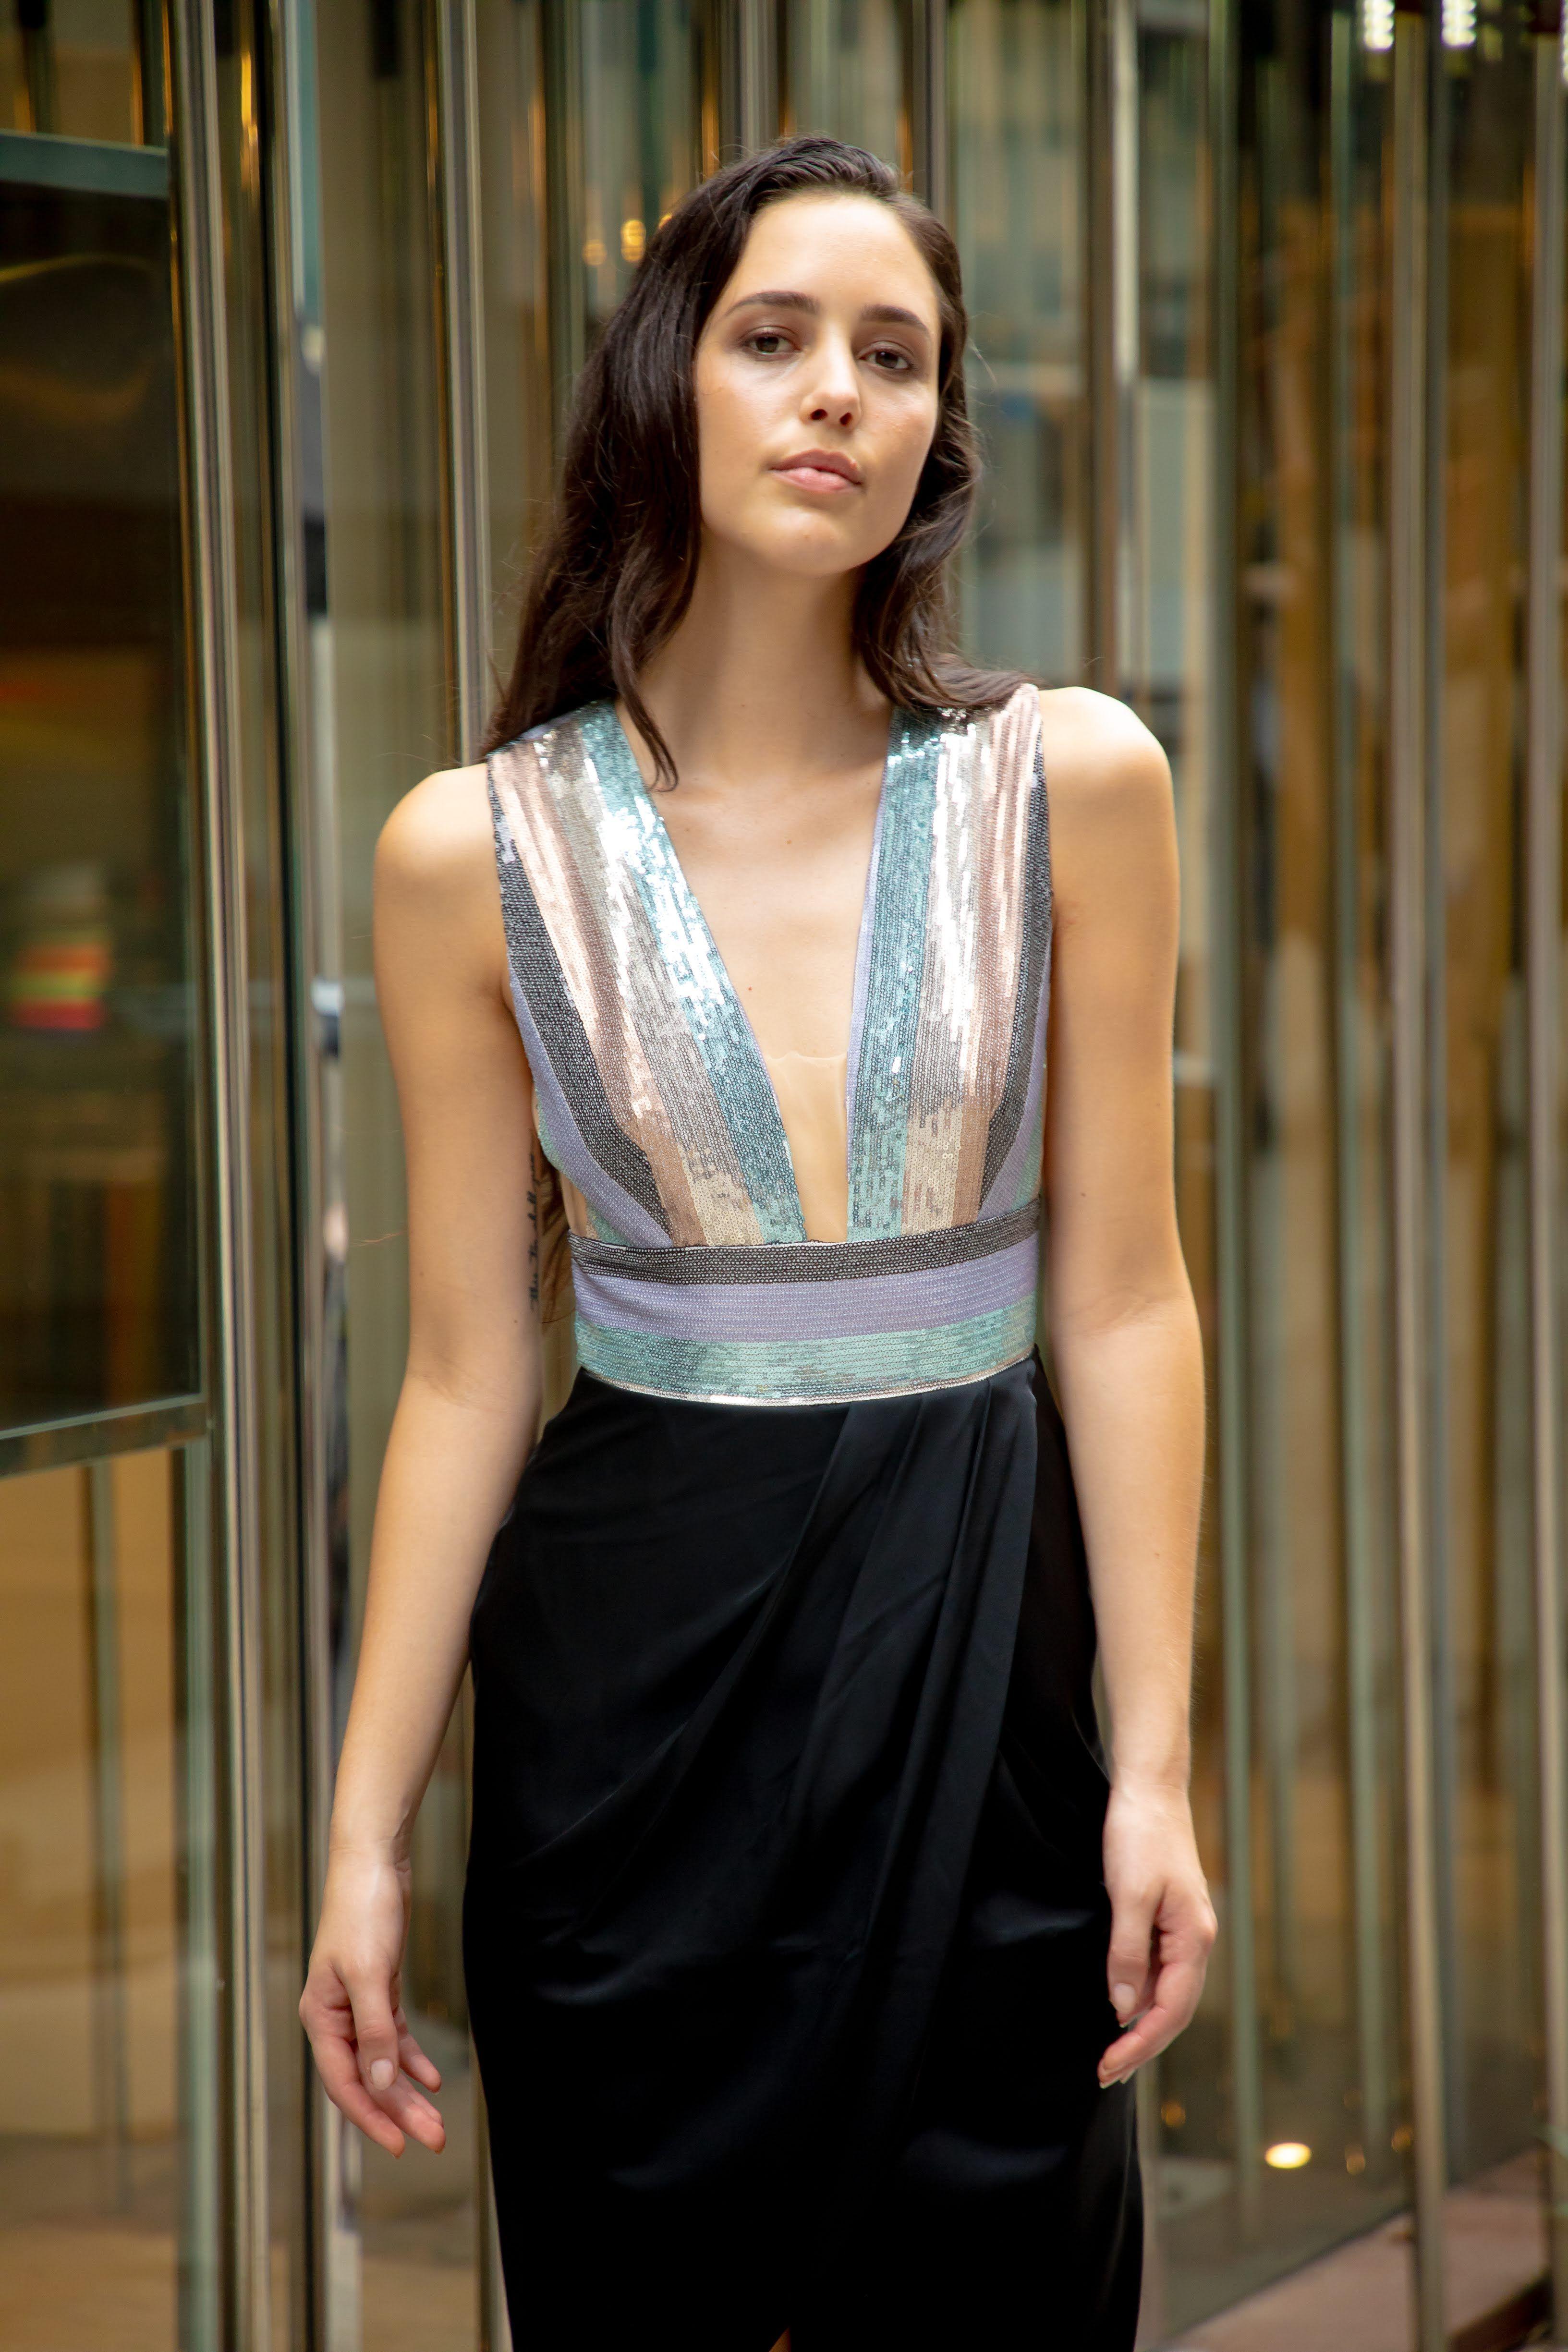 d67aa217c2 Sequin Top Cocktail Dress